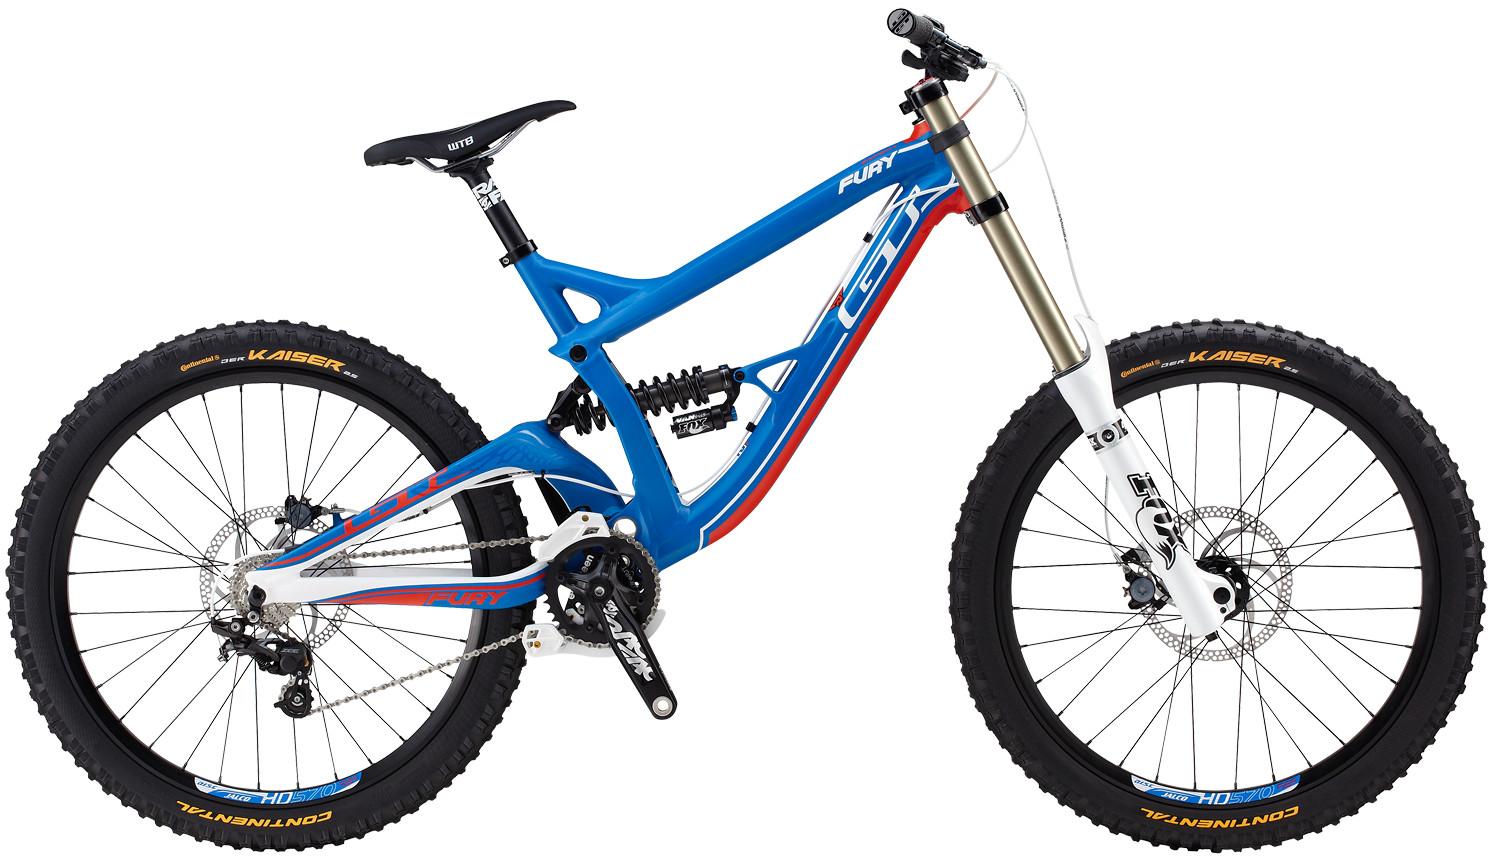 2014 GT Fury Expert Bike G14_26M_Fury_Expert_BLU